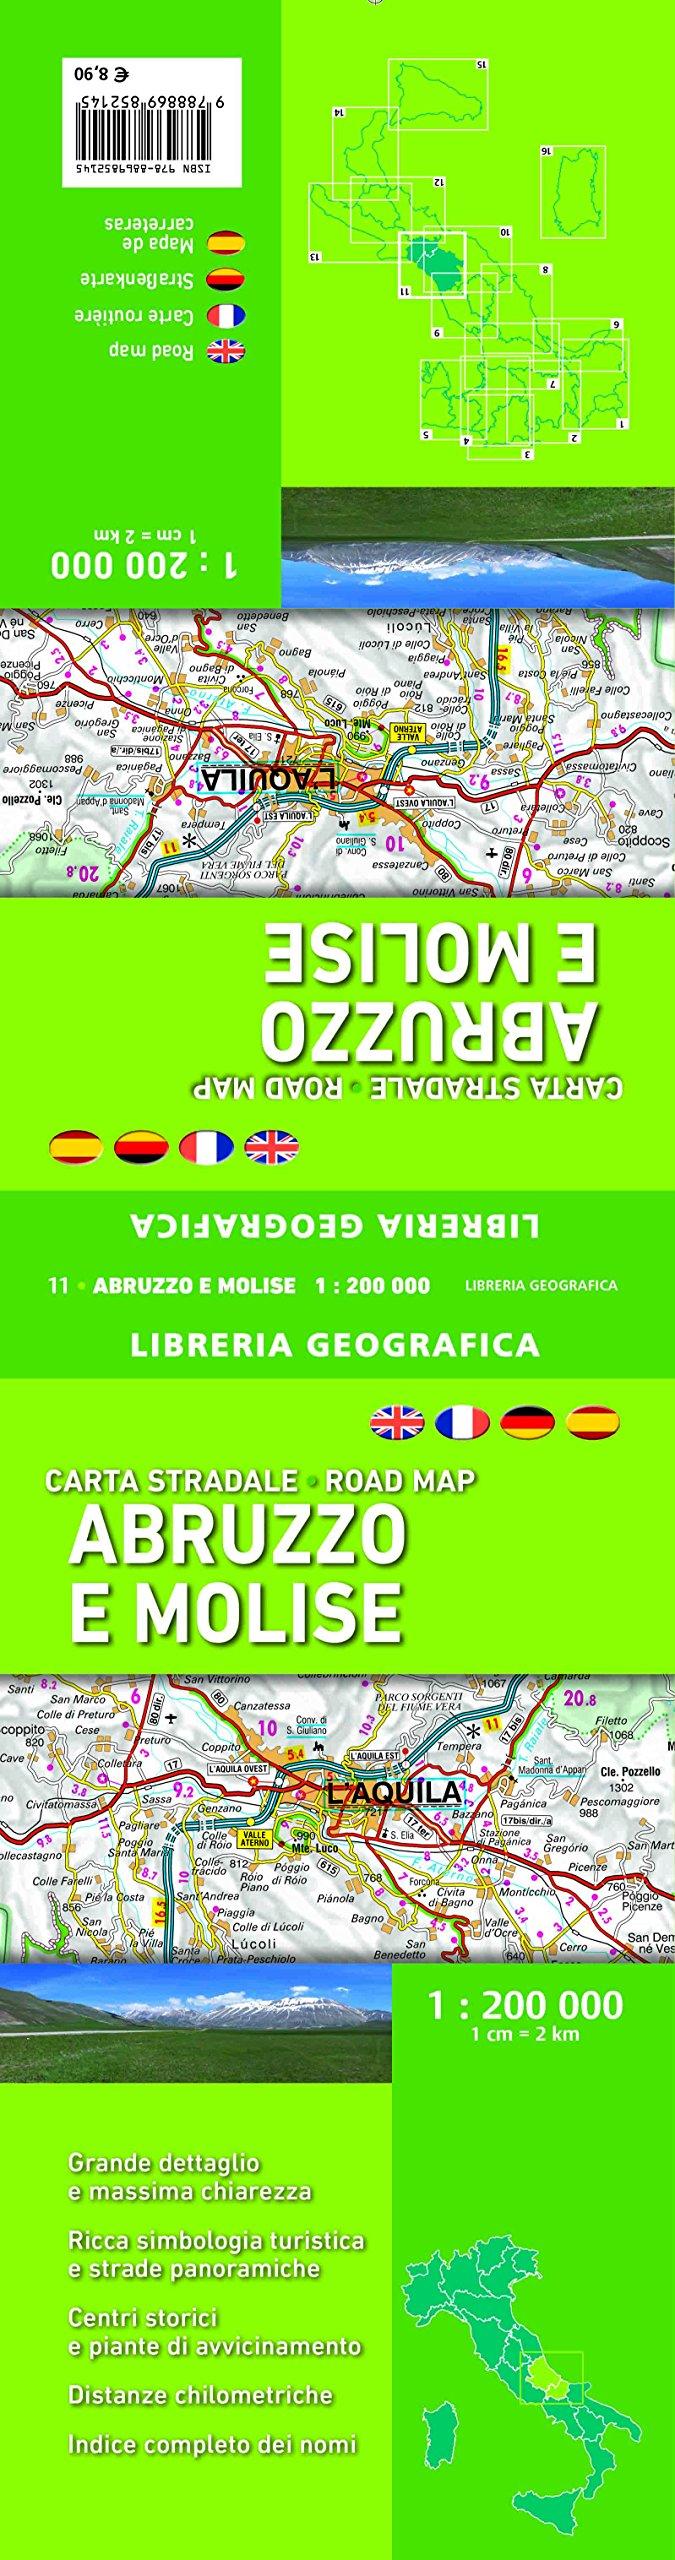 Cartina Stradale Abruzzo Molise.Amazon It Carta Stradale Abruzzo E Molise 1 200 000 Libri